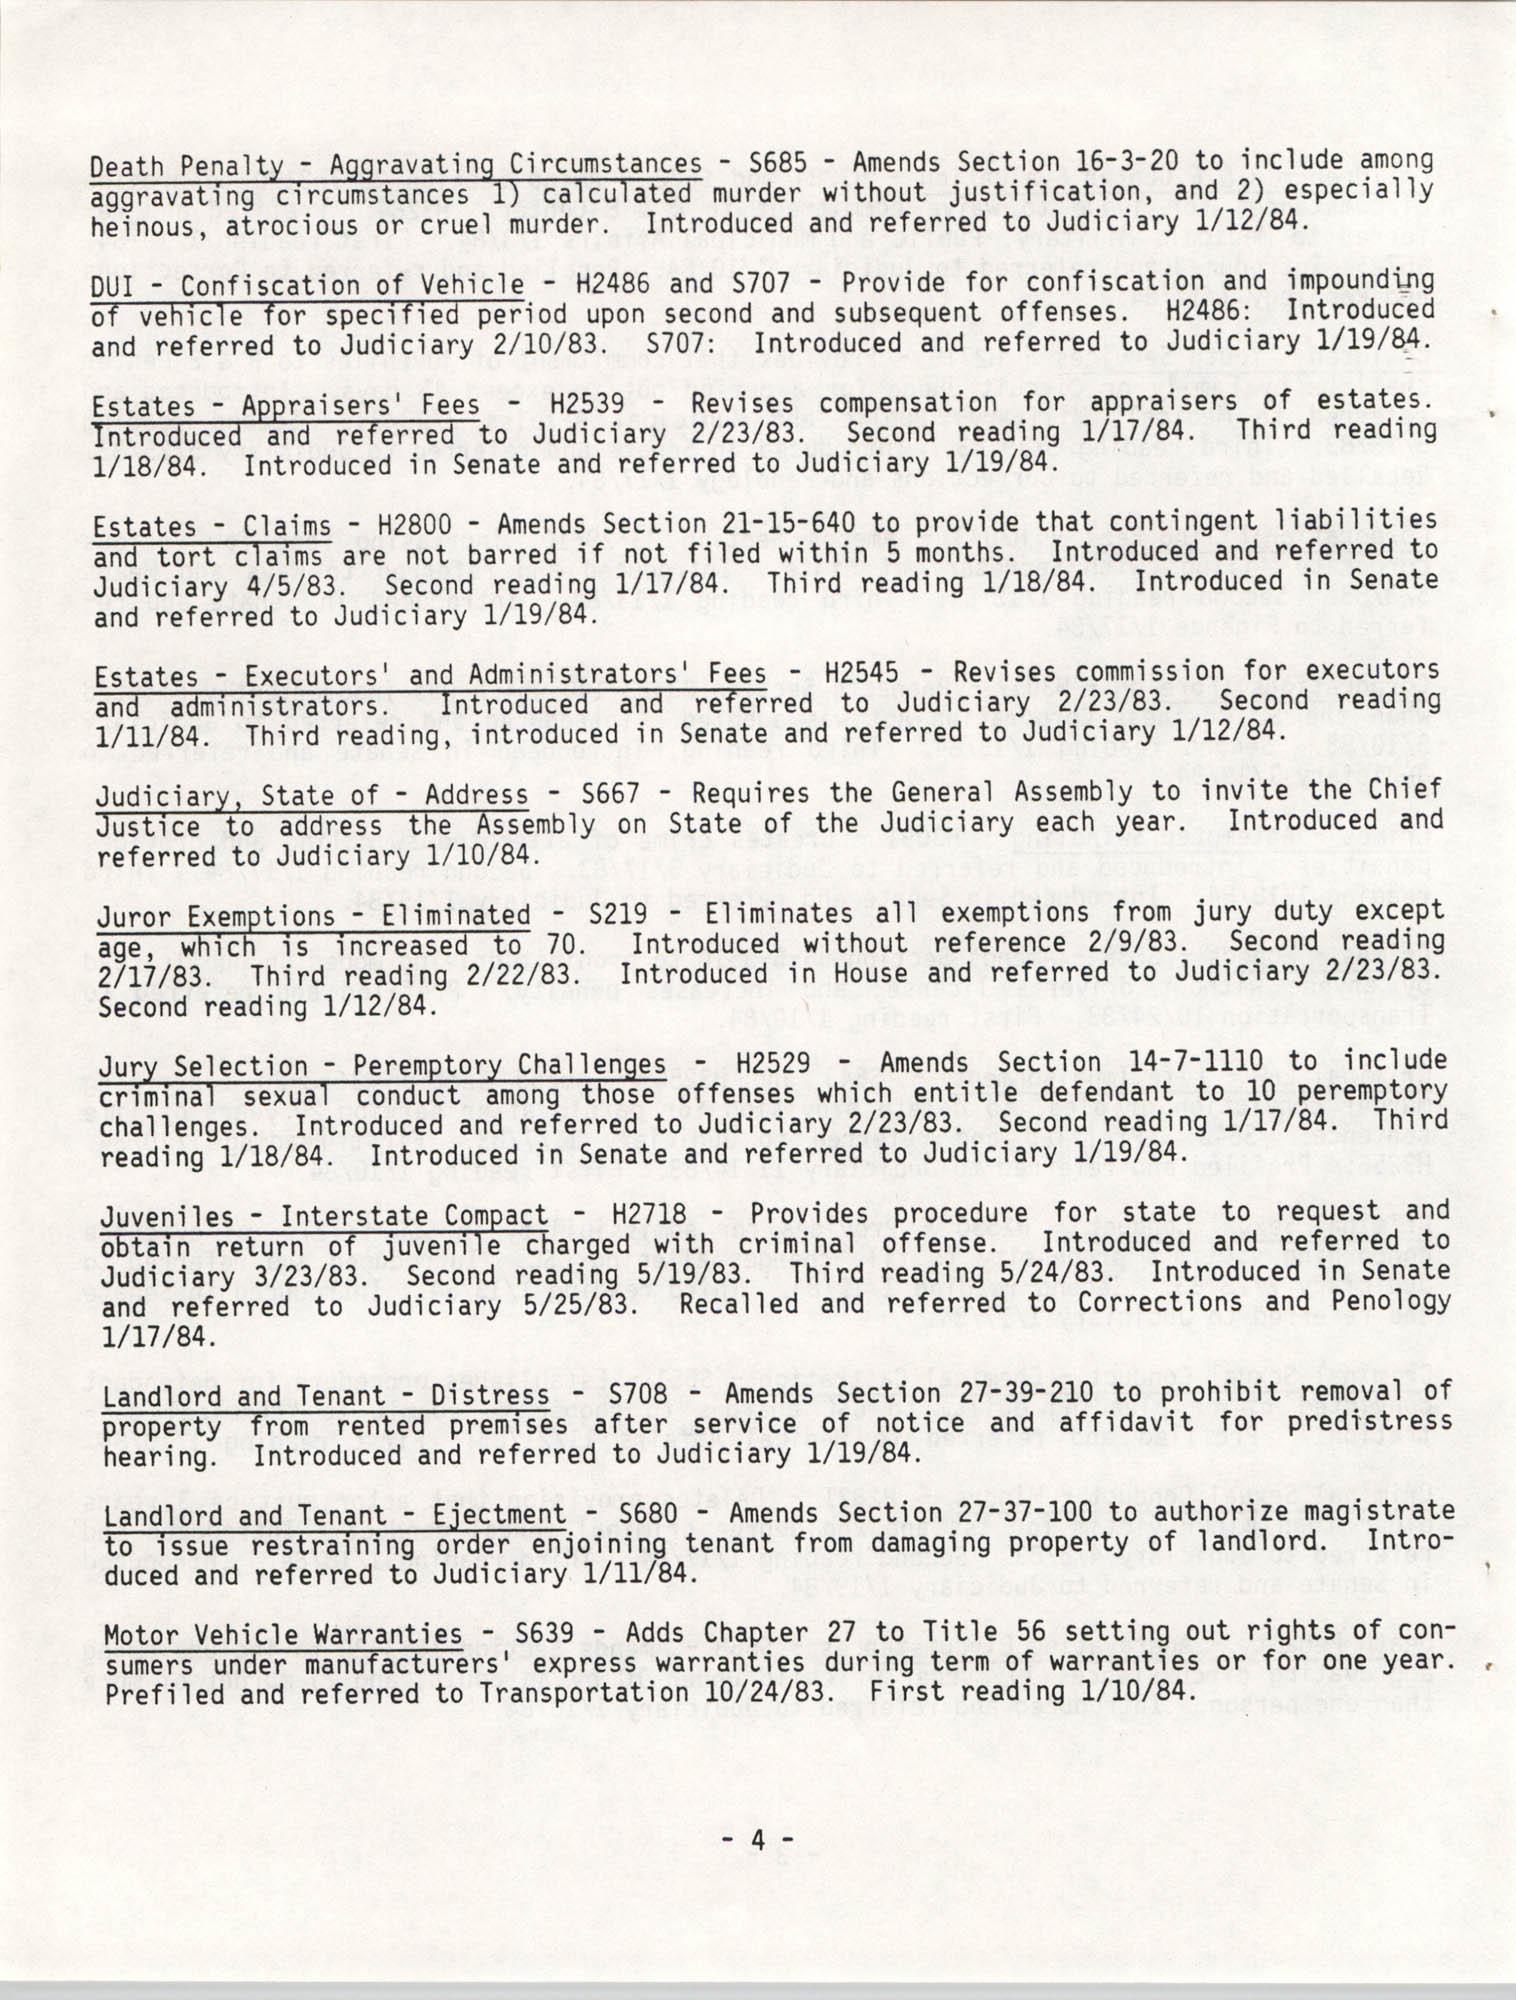 South Carolina Bar Legislative Roundup, Vol. 6 No. 1, January 26, 1984, Page 4